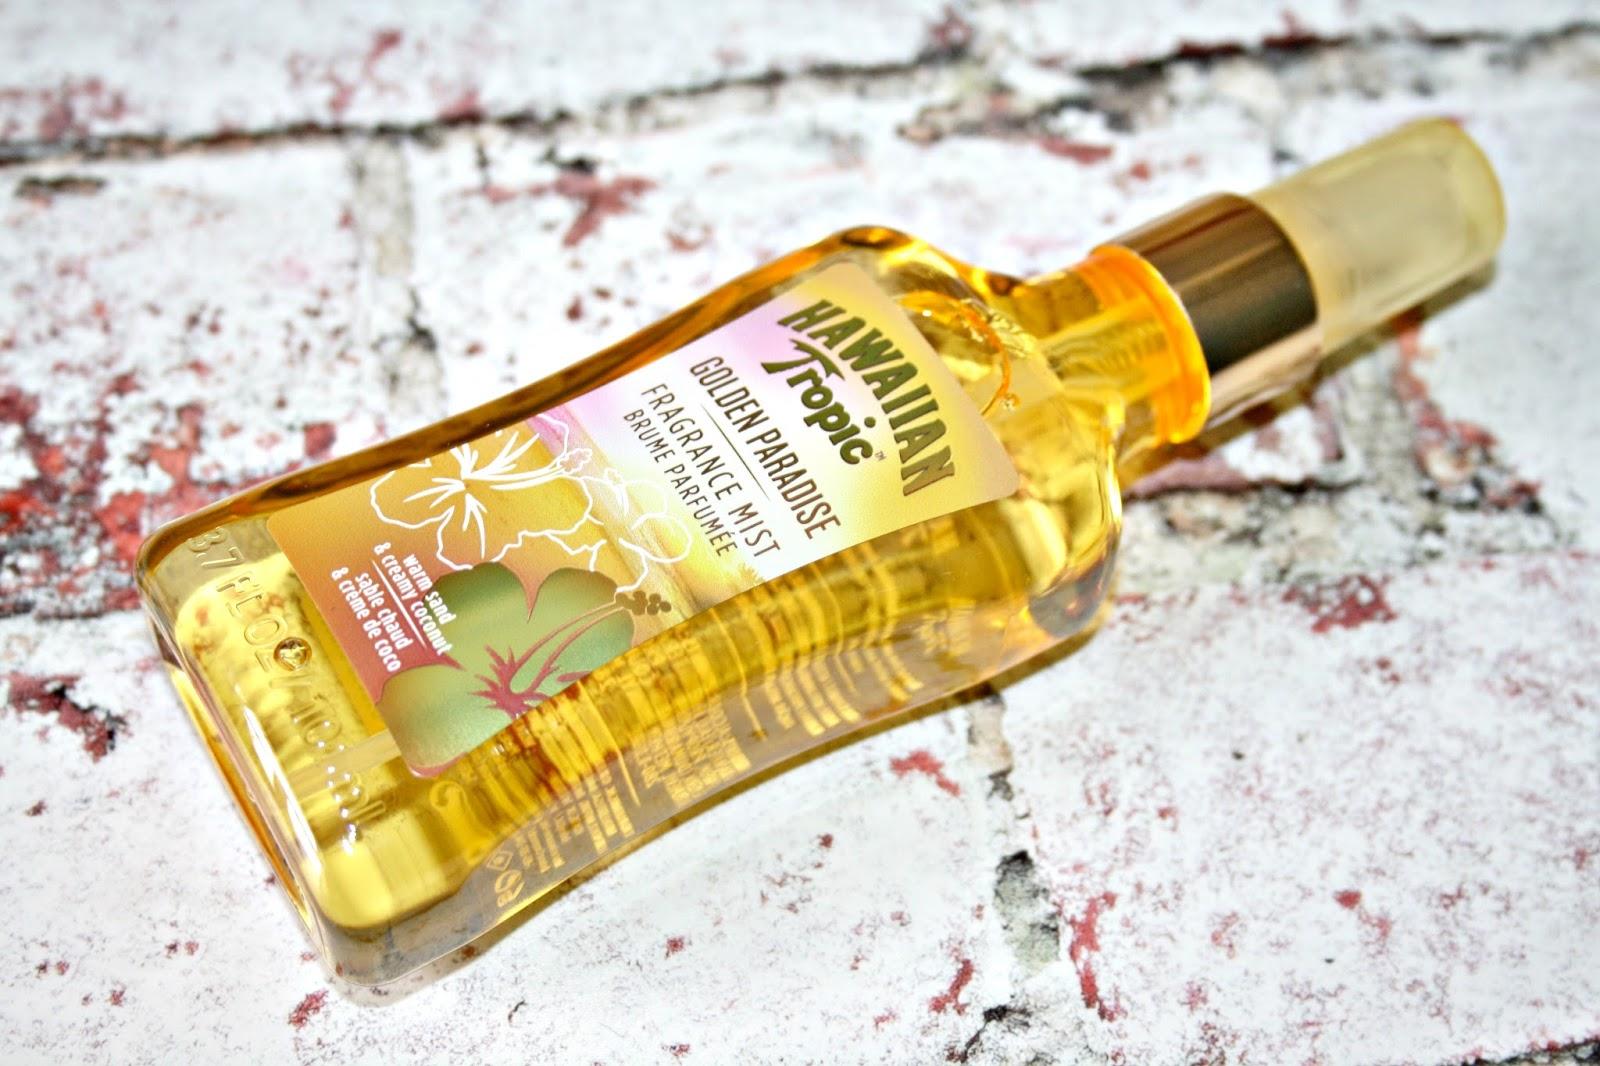 c068755504 Hawaiian Tropic Fragrance Mist Collection